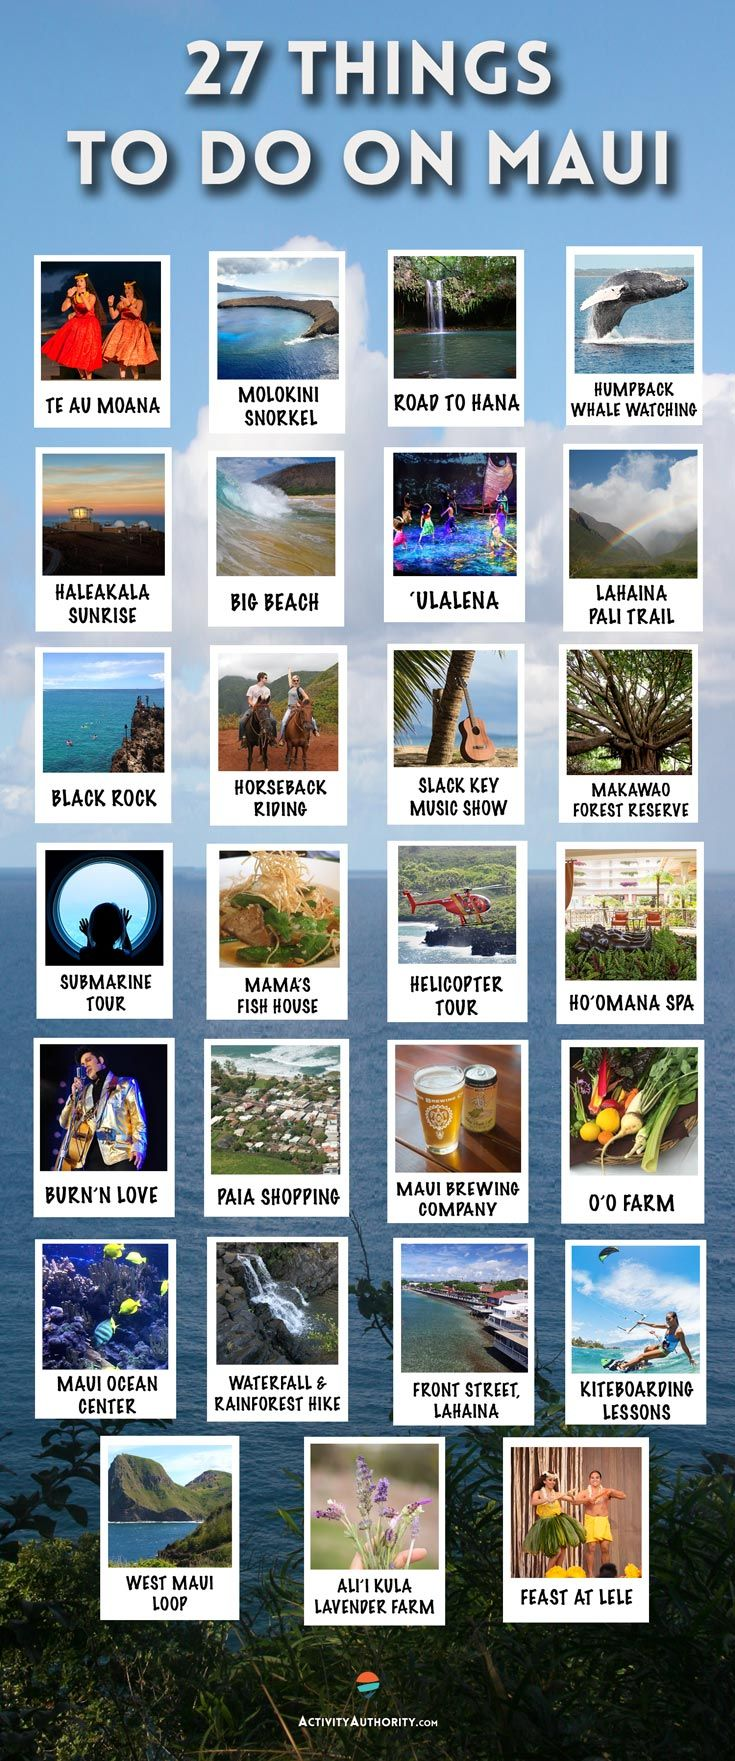 27 Things to Do on Maui | Molokini Snorkel, Whale Watching, Big Beach